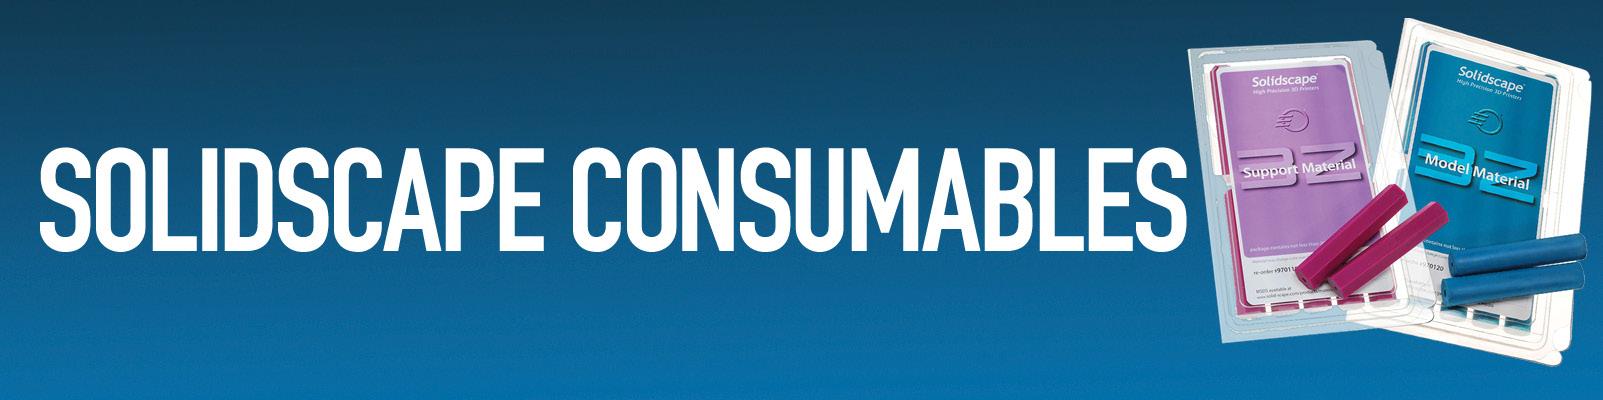 Solidscape Consumables